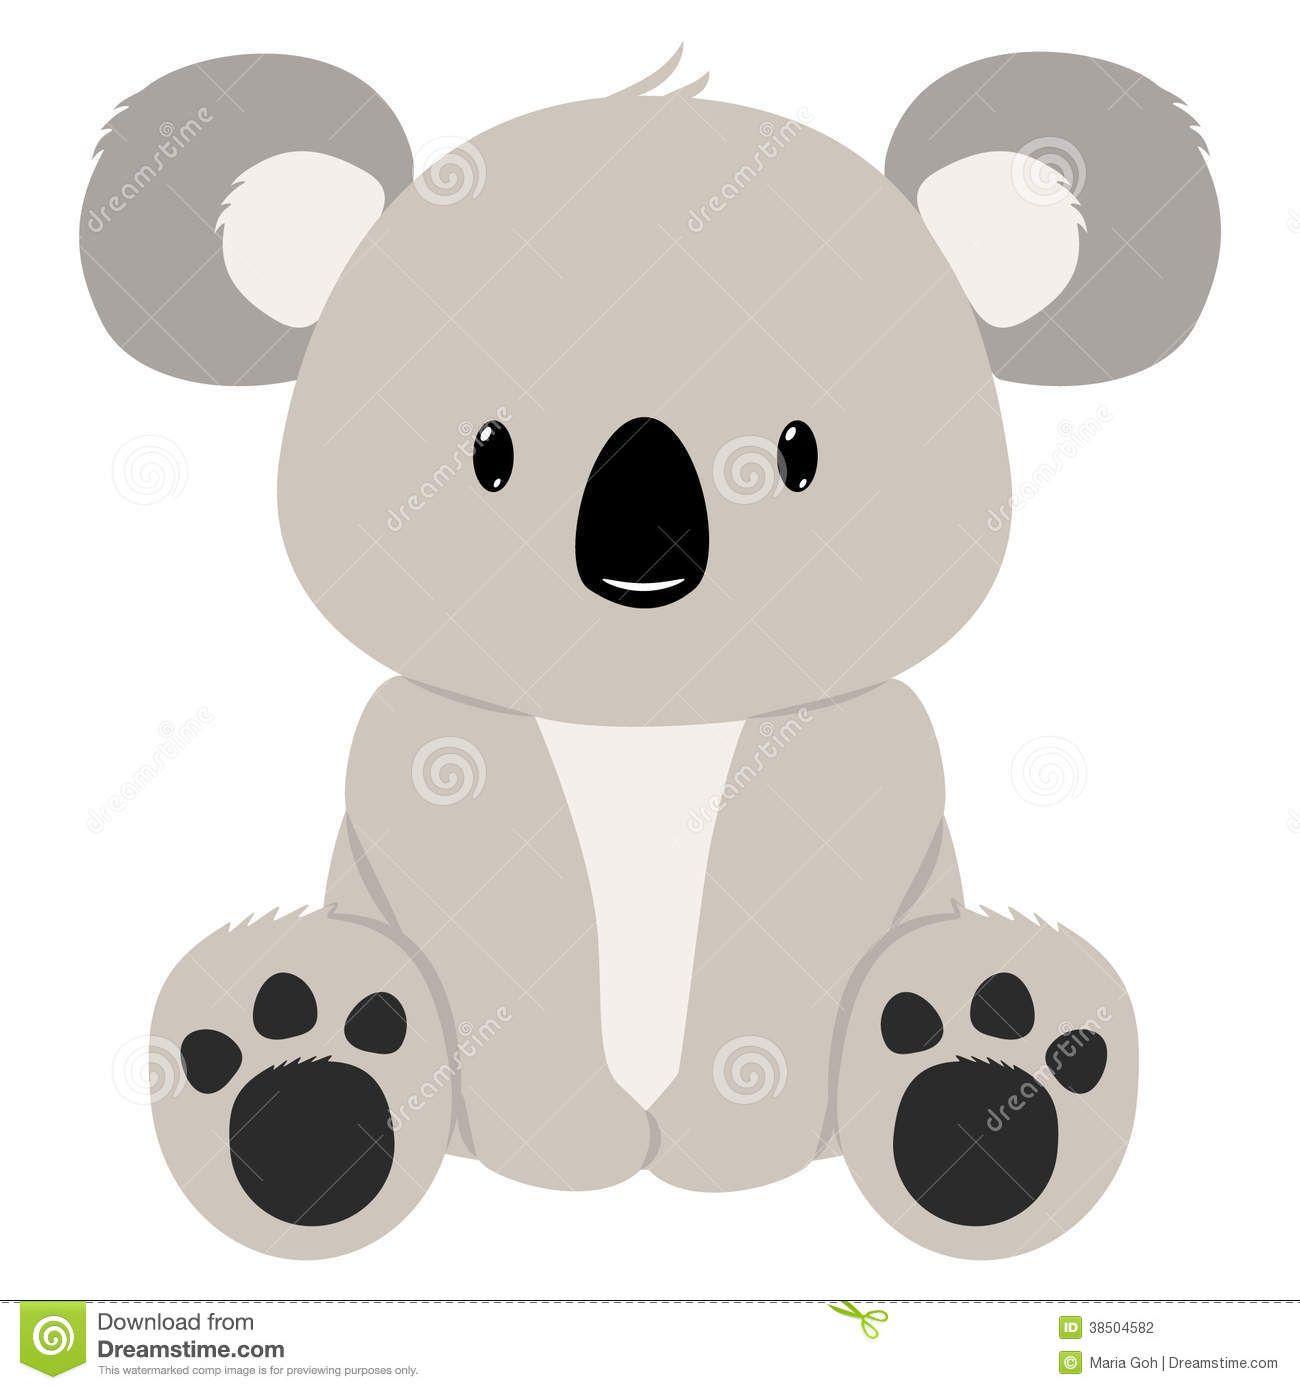 koala clipart 53 3d koala pinterest rh pinterest co uk koala clipart cute koala clipart black and white